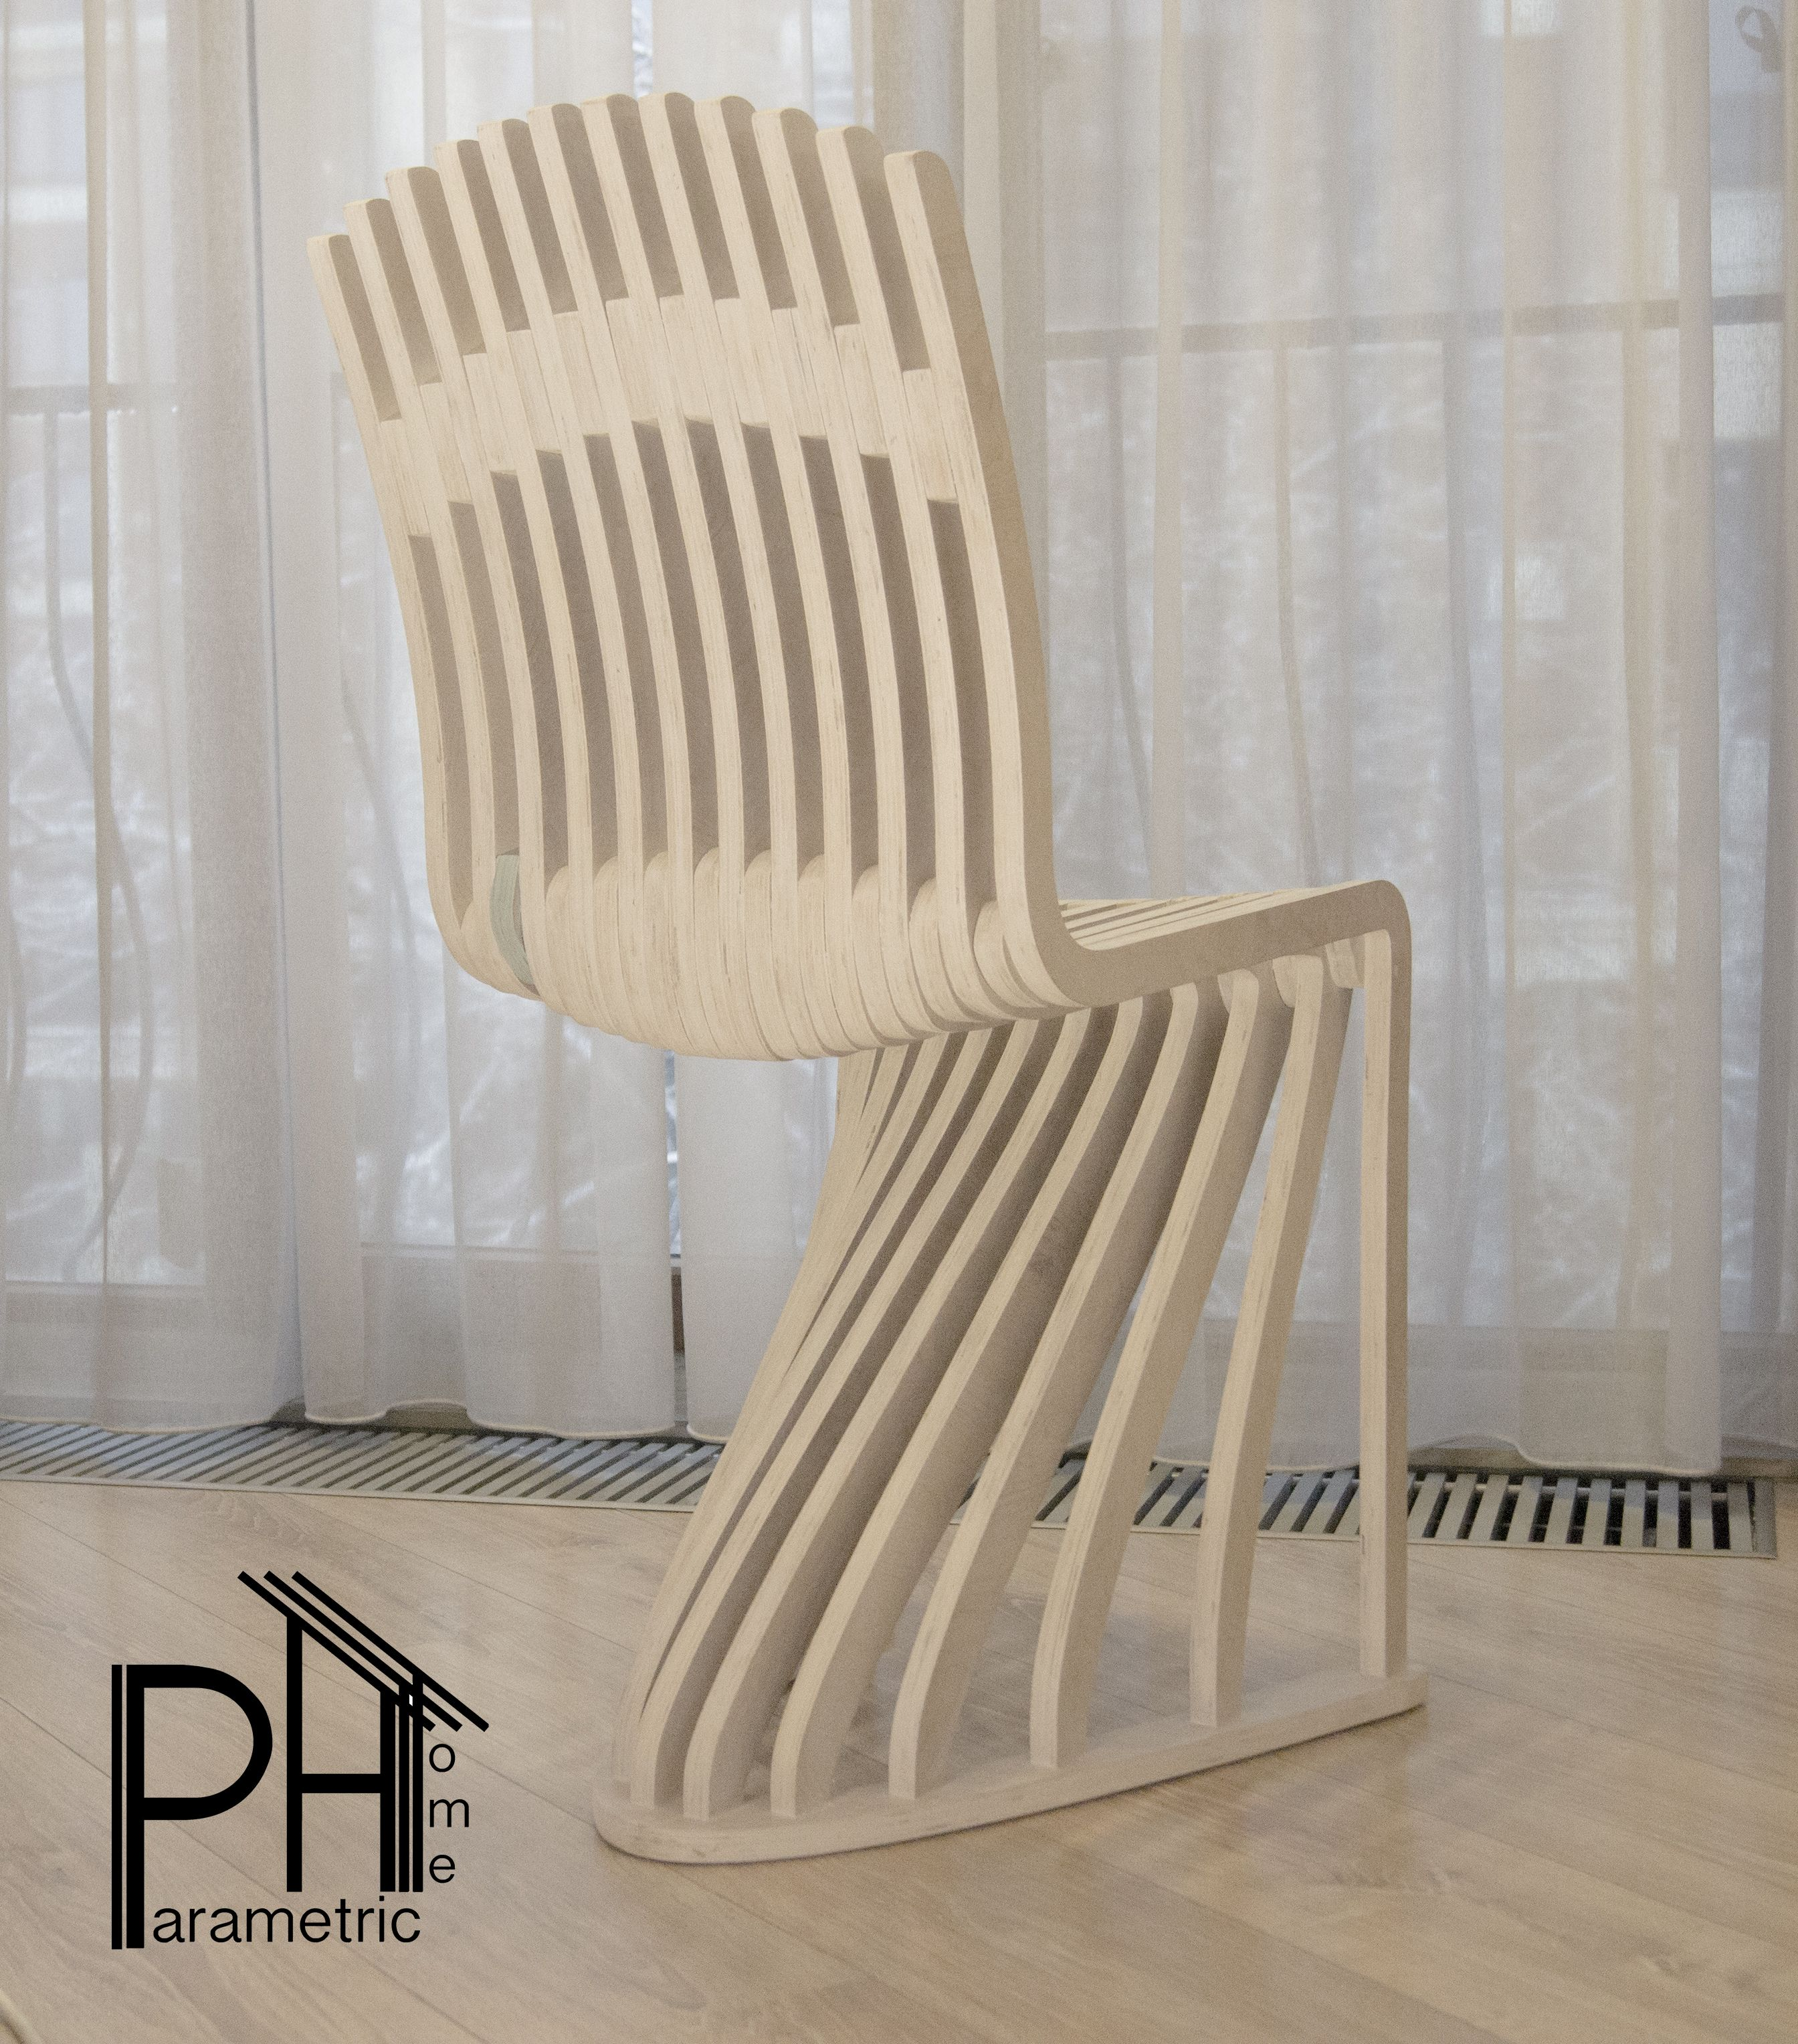 стул белый со спинкой фанера , параметрический White Chair With Plywood  Back, Parametric